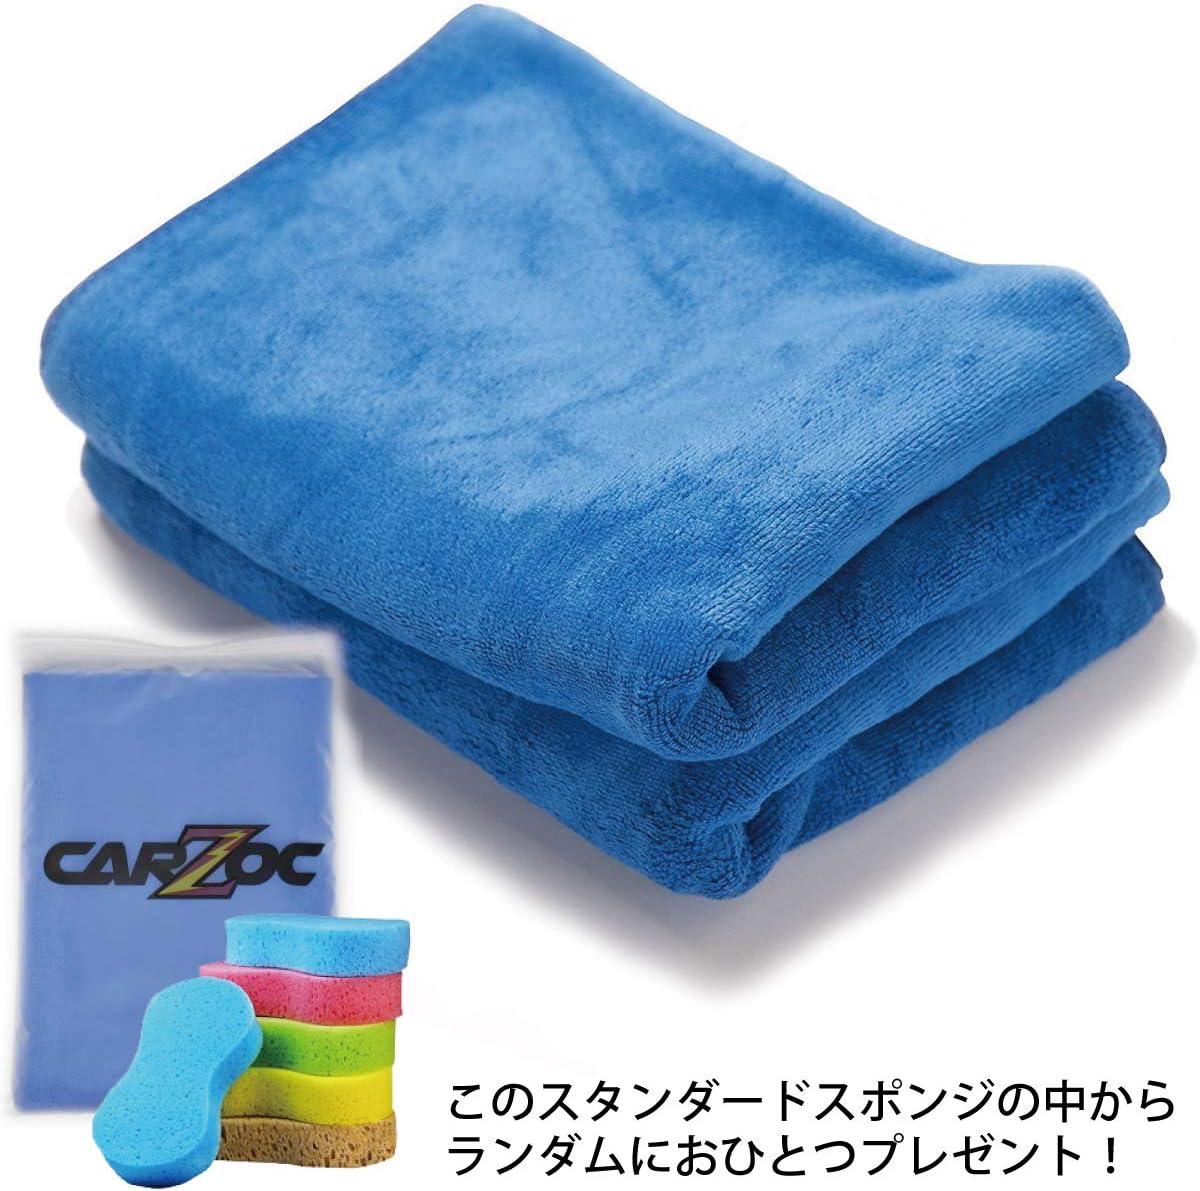 【 CARZOC 】 最優秀賞受賞 マイクロファイバー 超吸水 タオル